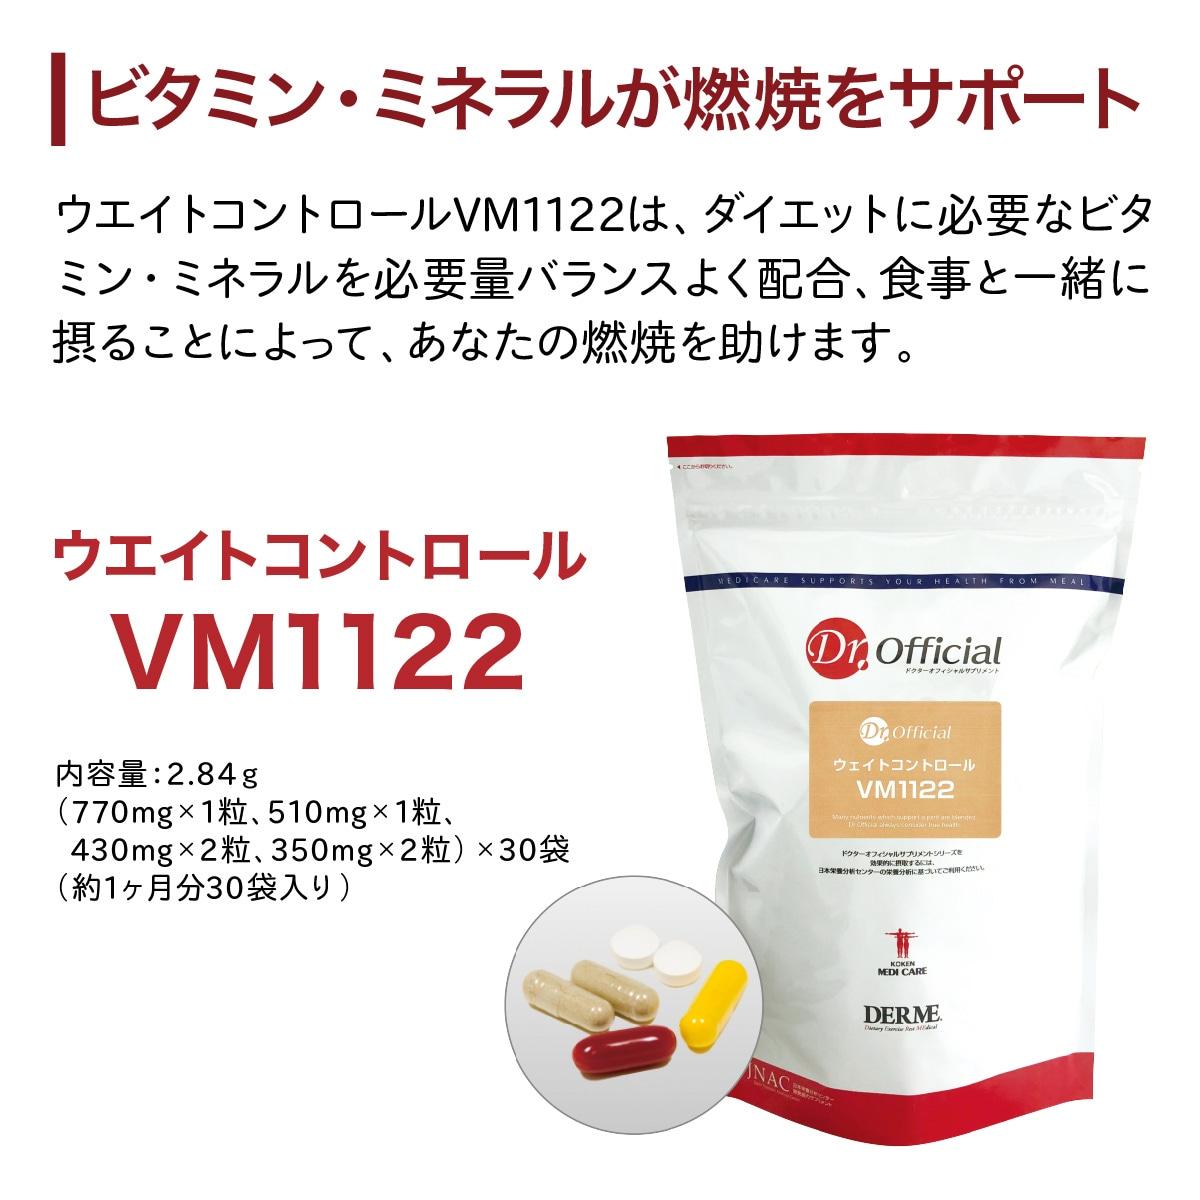 VM1122